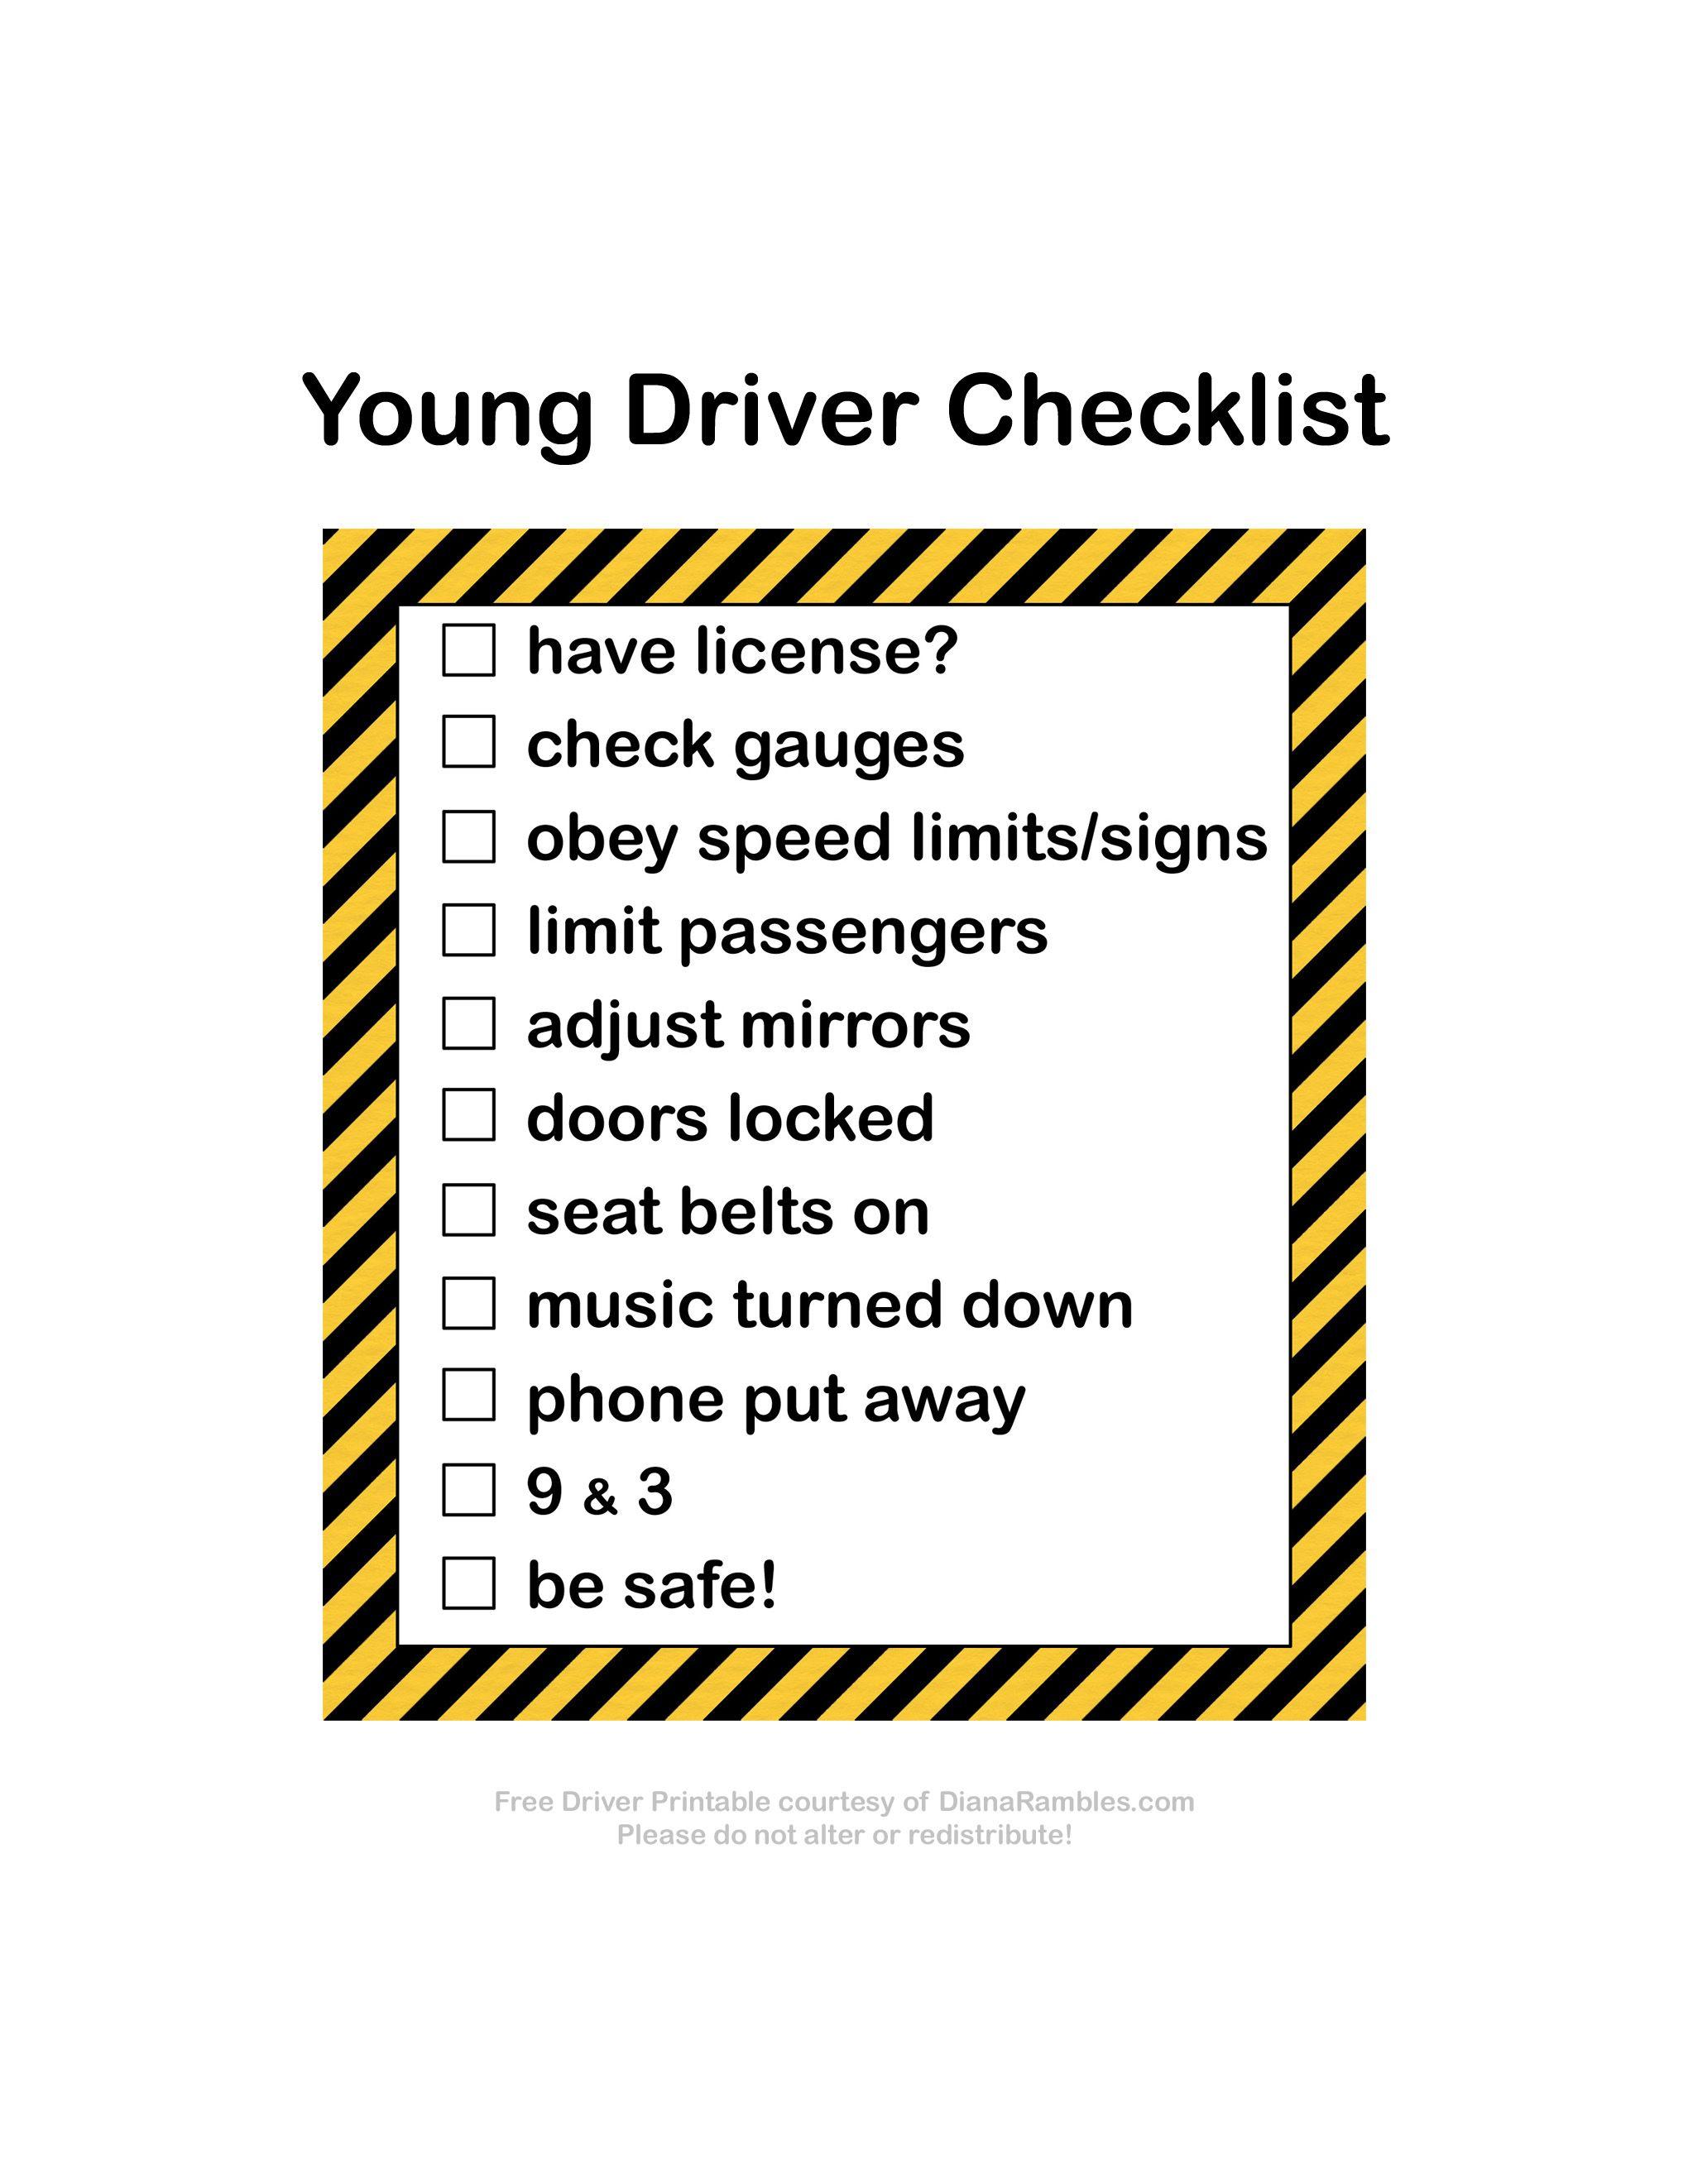 New Driver Checklist Free Printable 1stimpressionscount Ad New Drivers Checklist Drivers